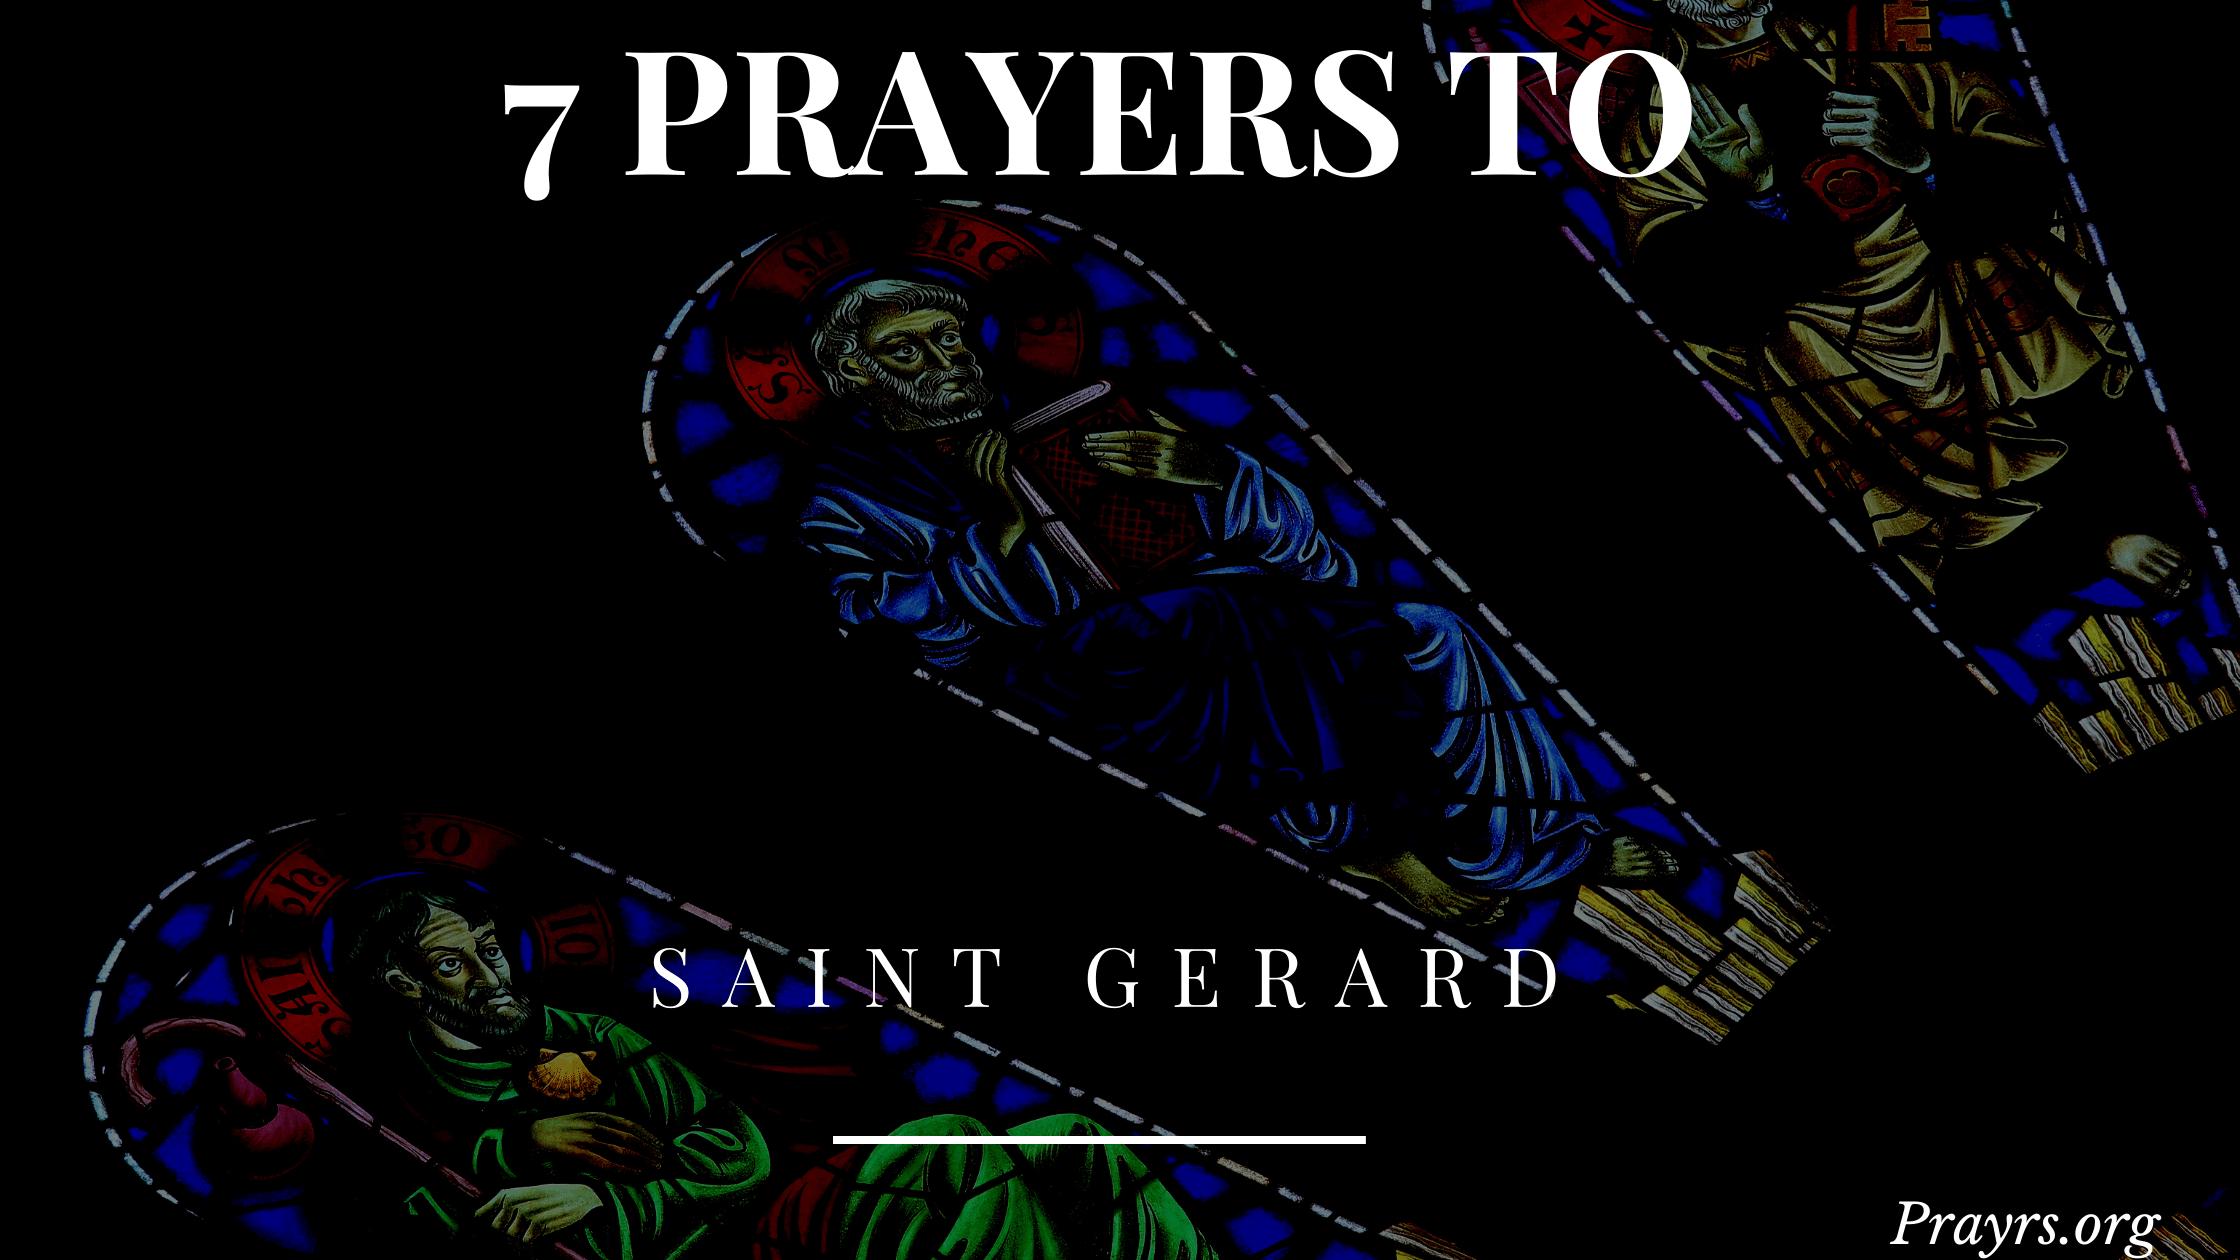 Saint Gerard Prayers